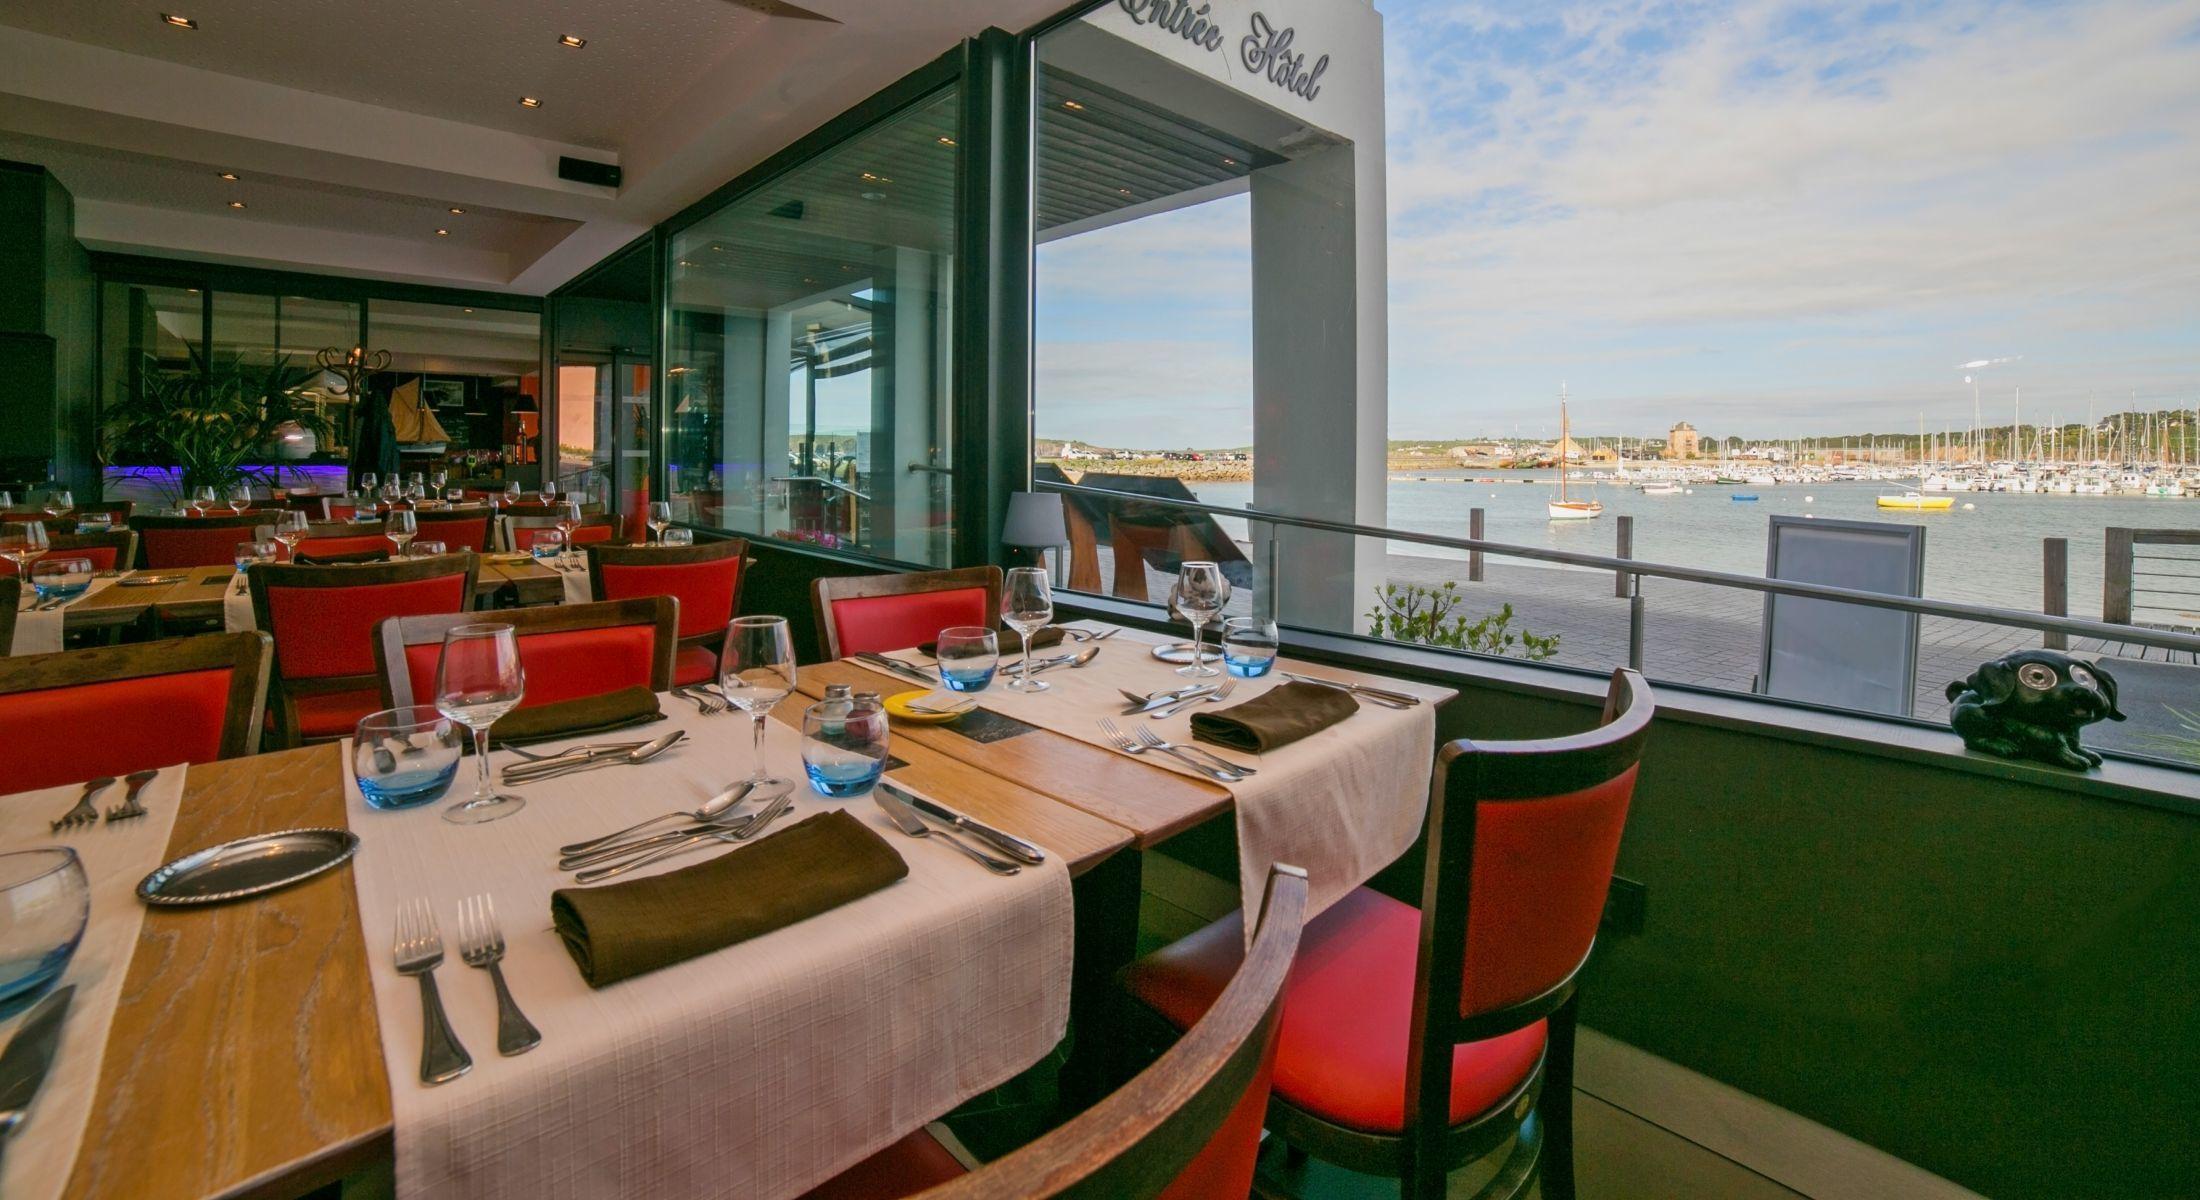 Restaurant Hôtel Camaret sur mer